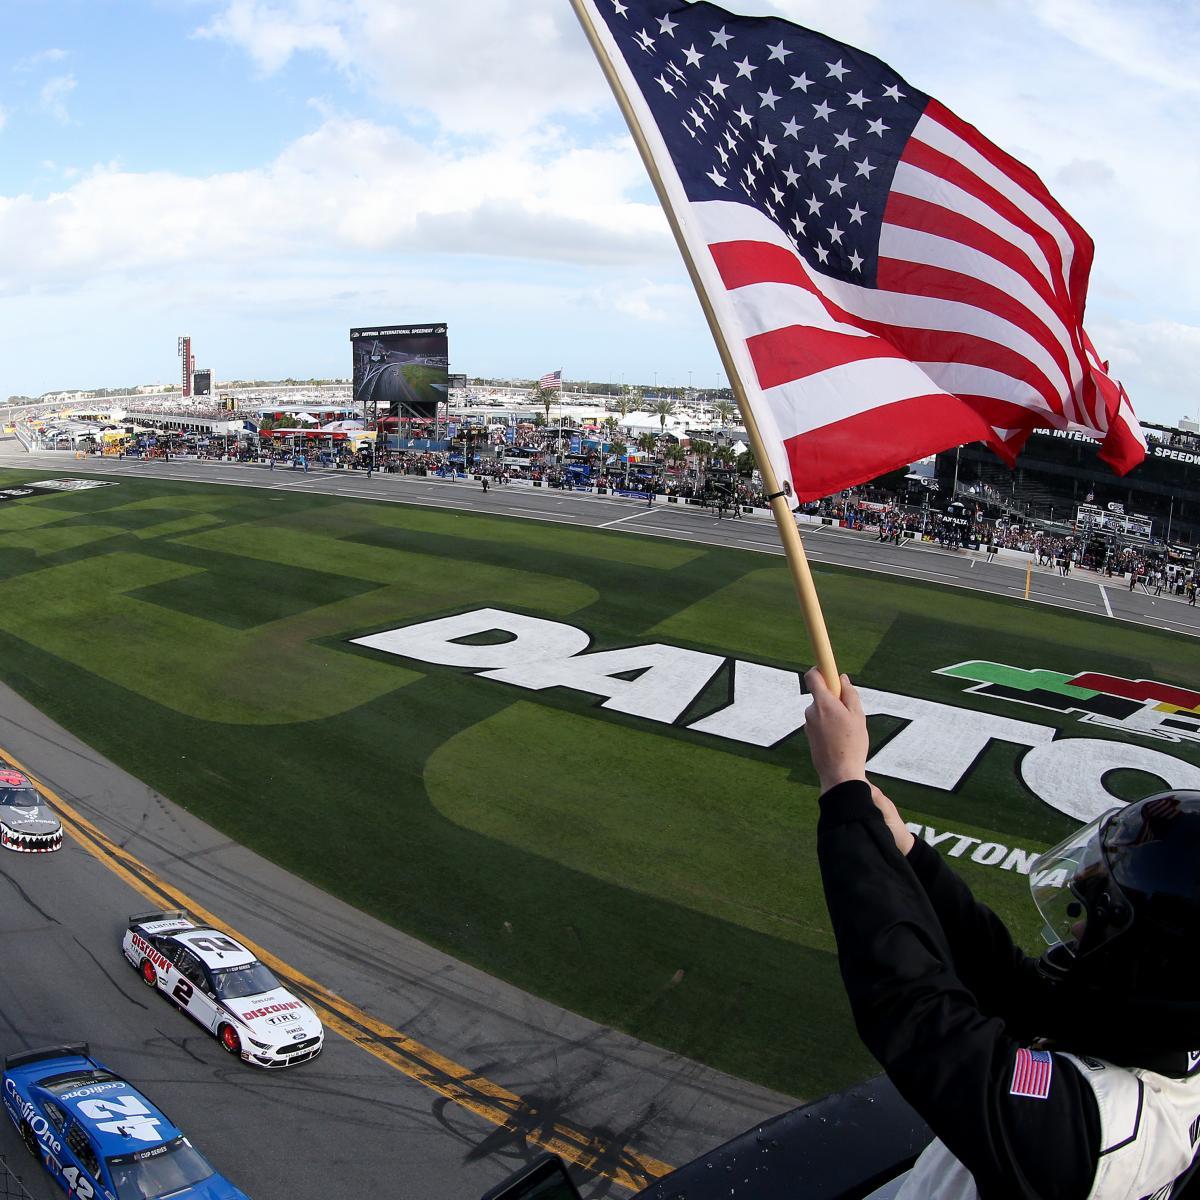 2020 Daytona 500: Start Time, TV Schedule, Odds, More for Postponed Race